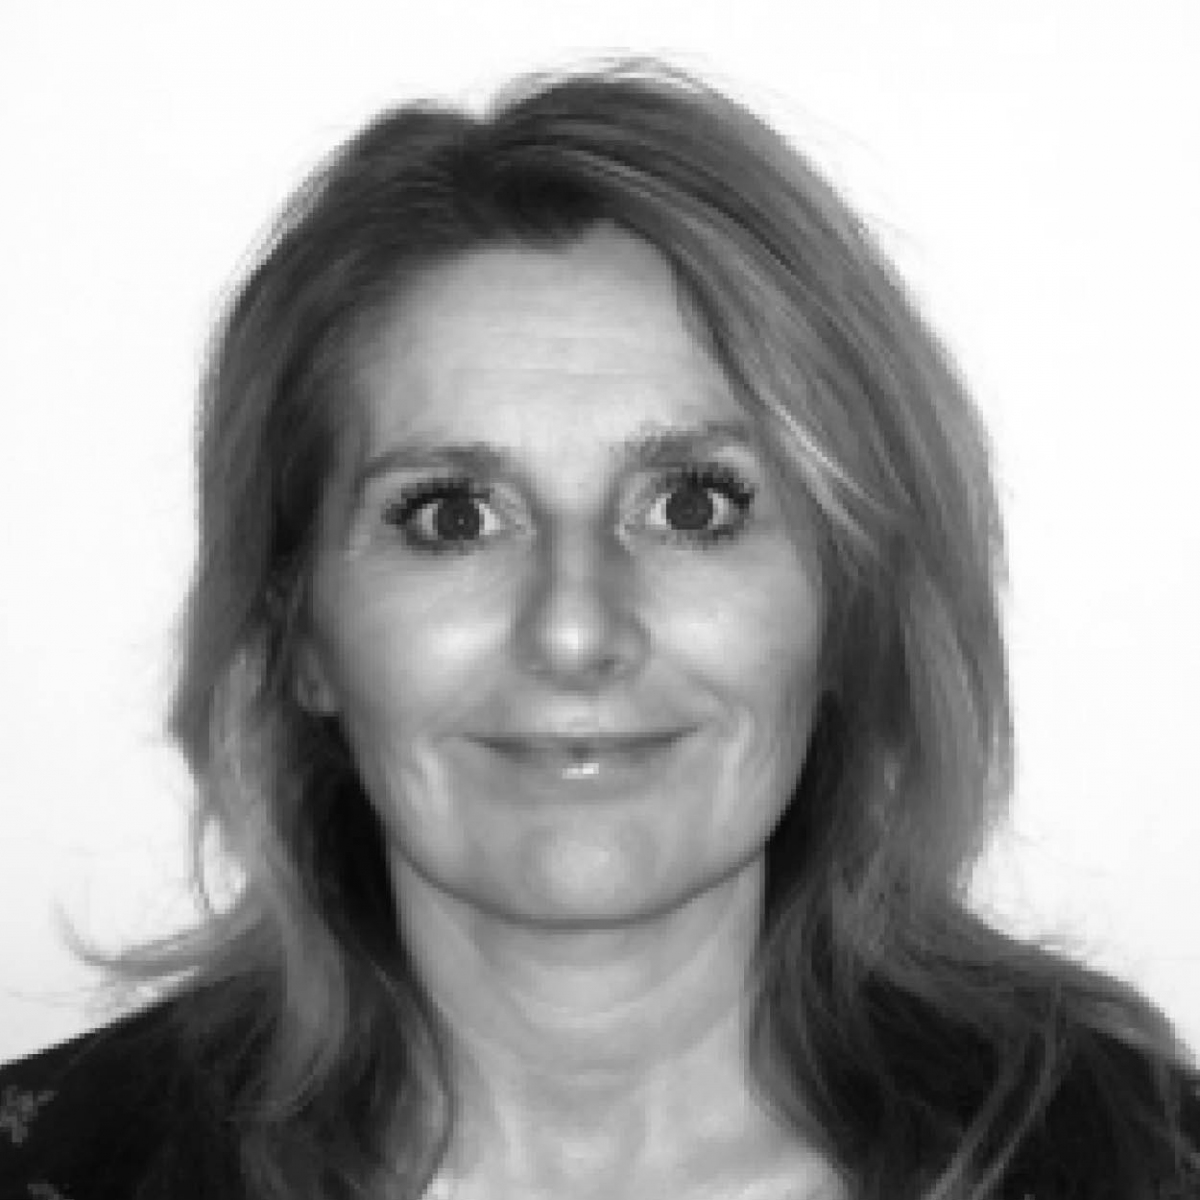 Gunn Velle Senior Salgskonsulent i Senab Eikeland